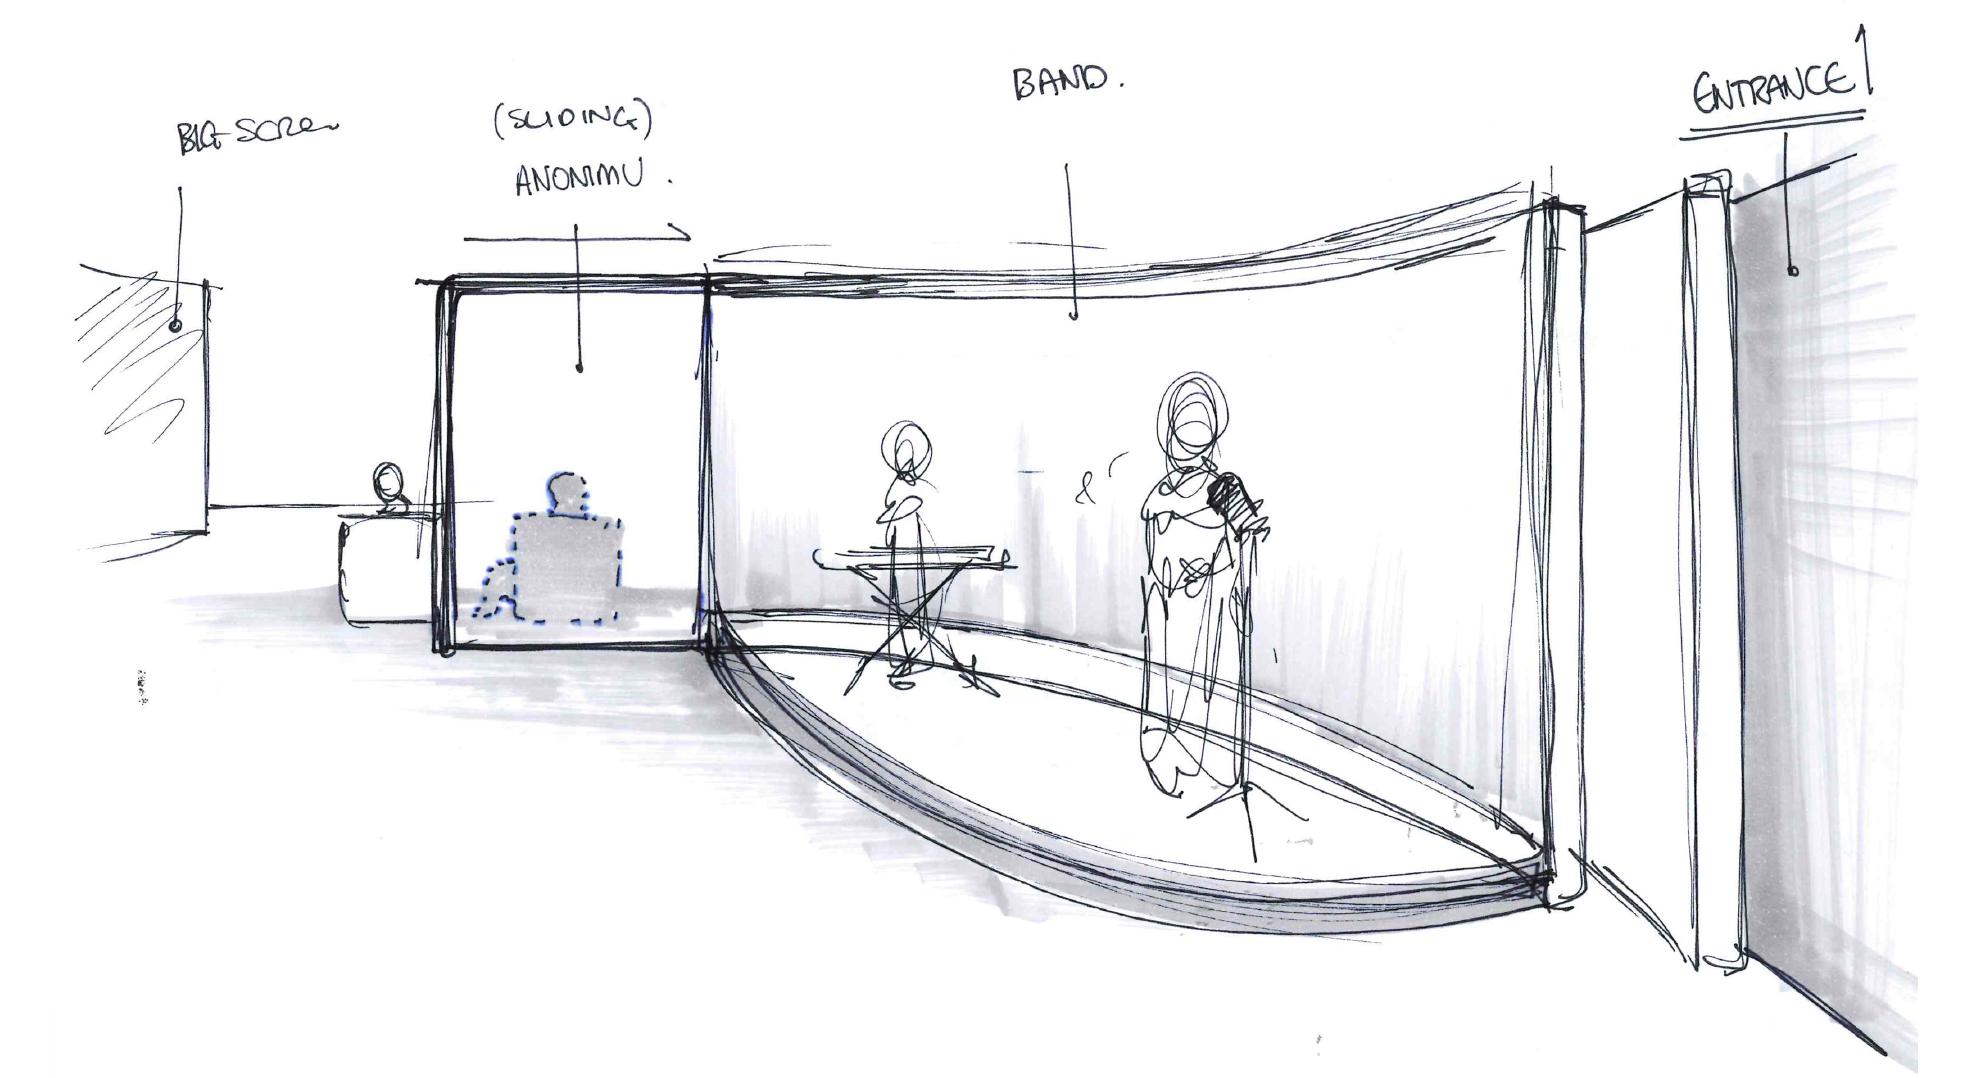 Xarabank - Sketch - Band, Entrances, Anonimu